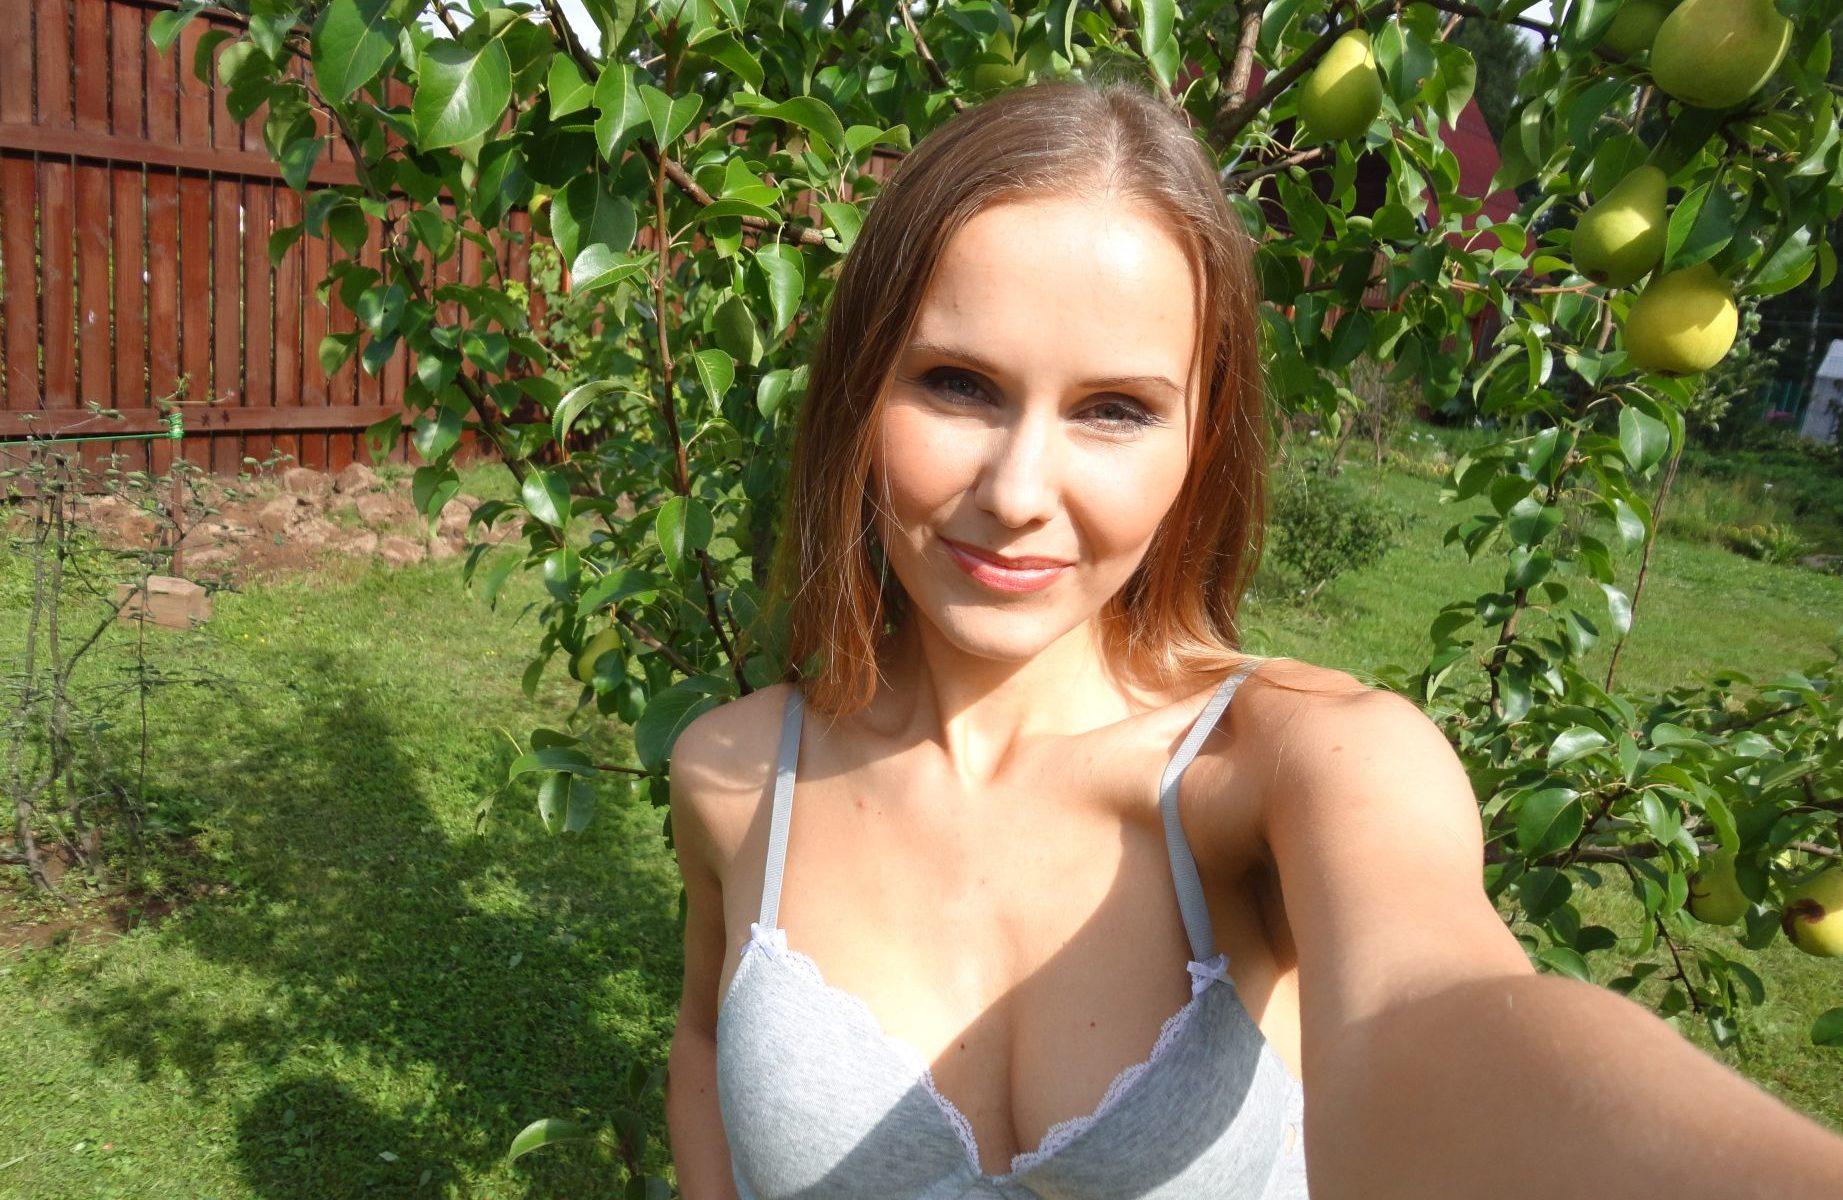 Sofortsexkontakte